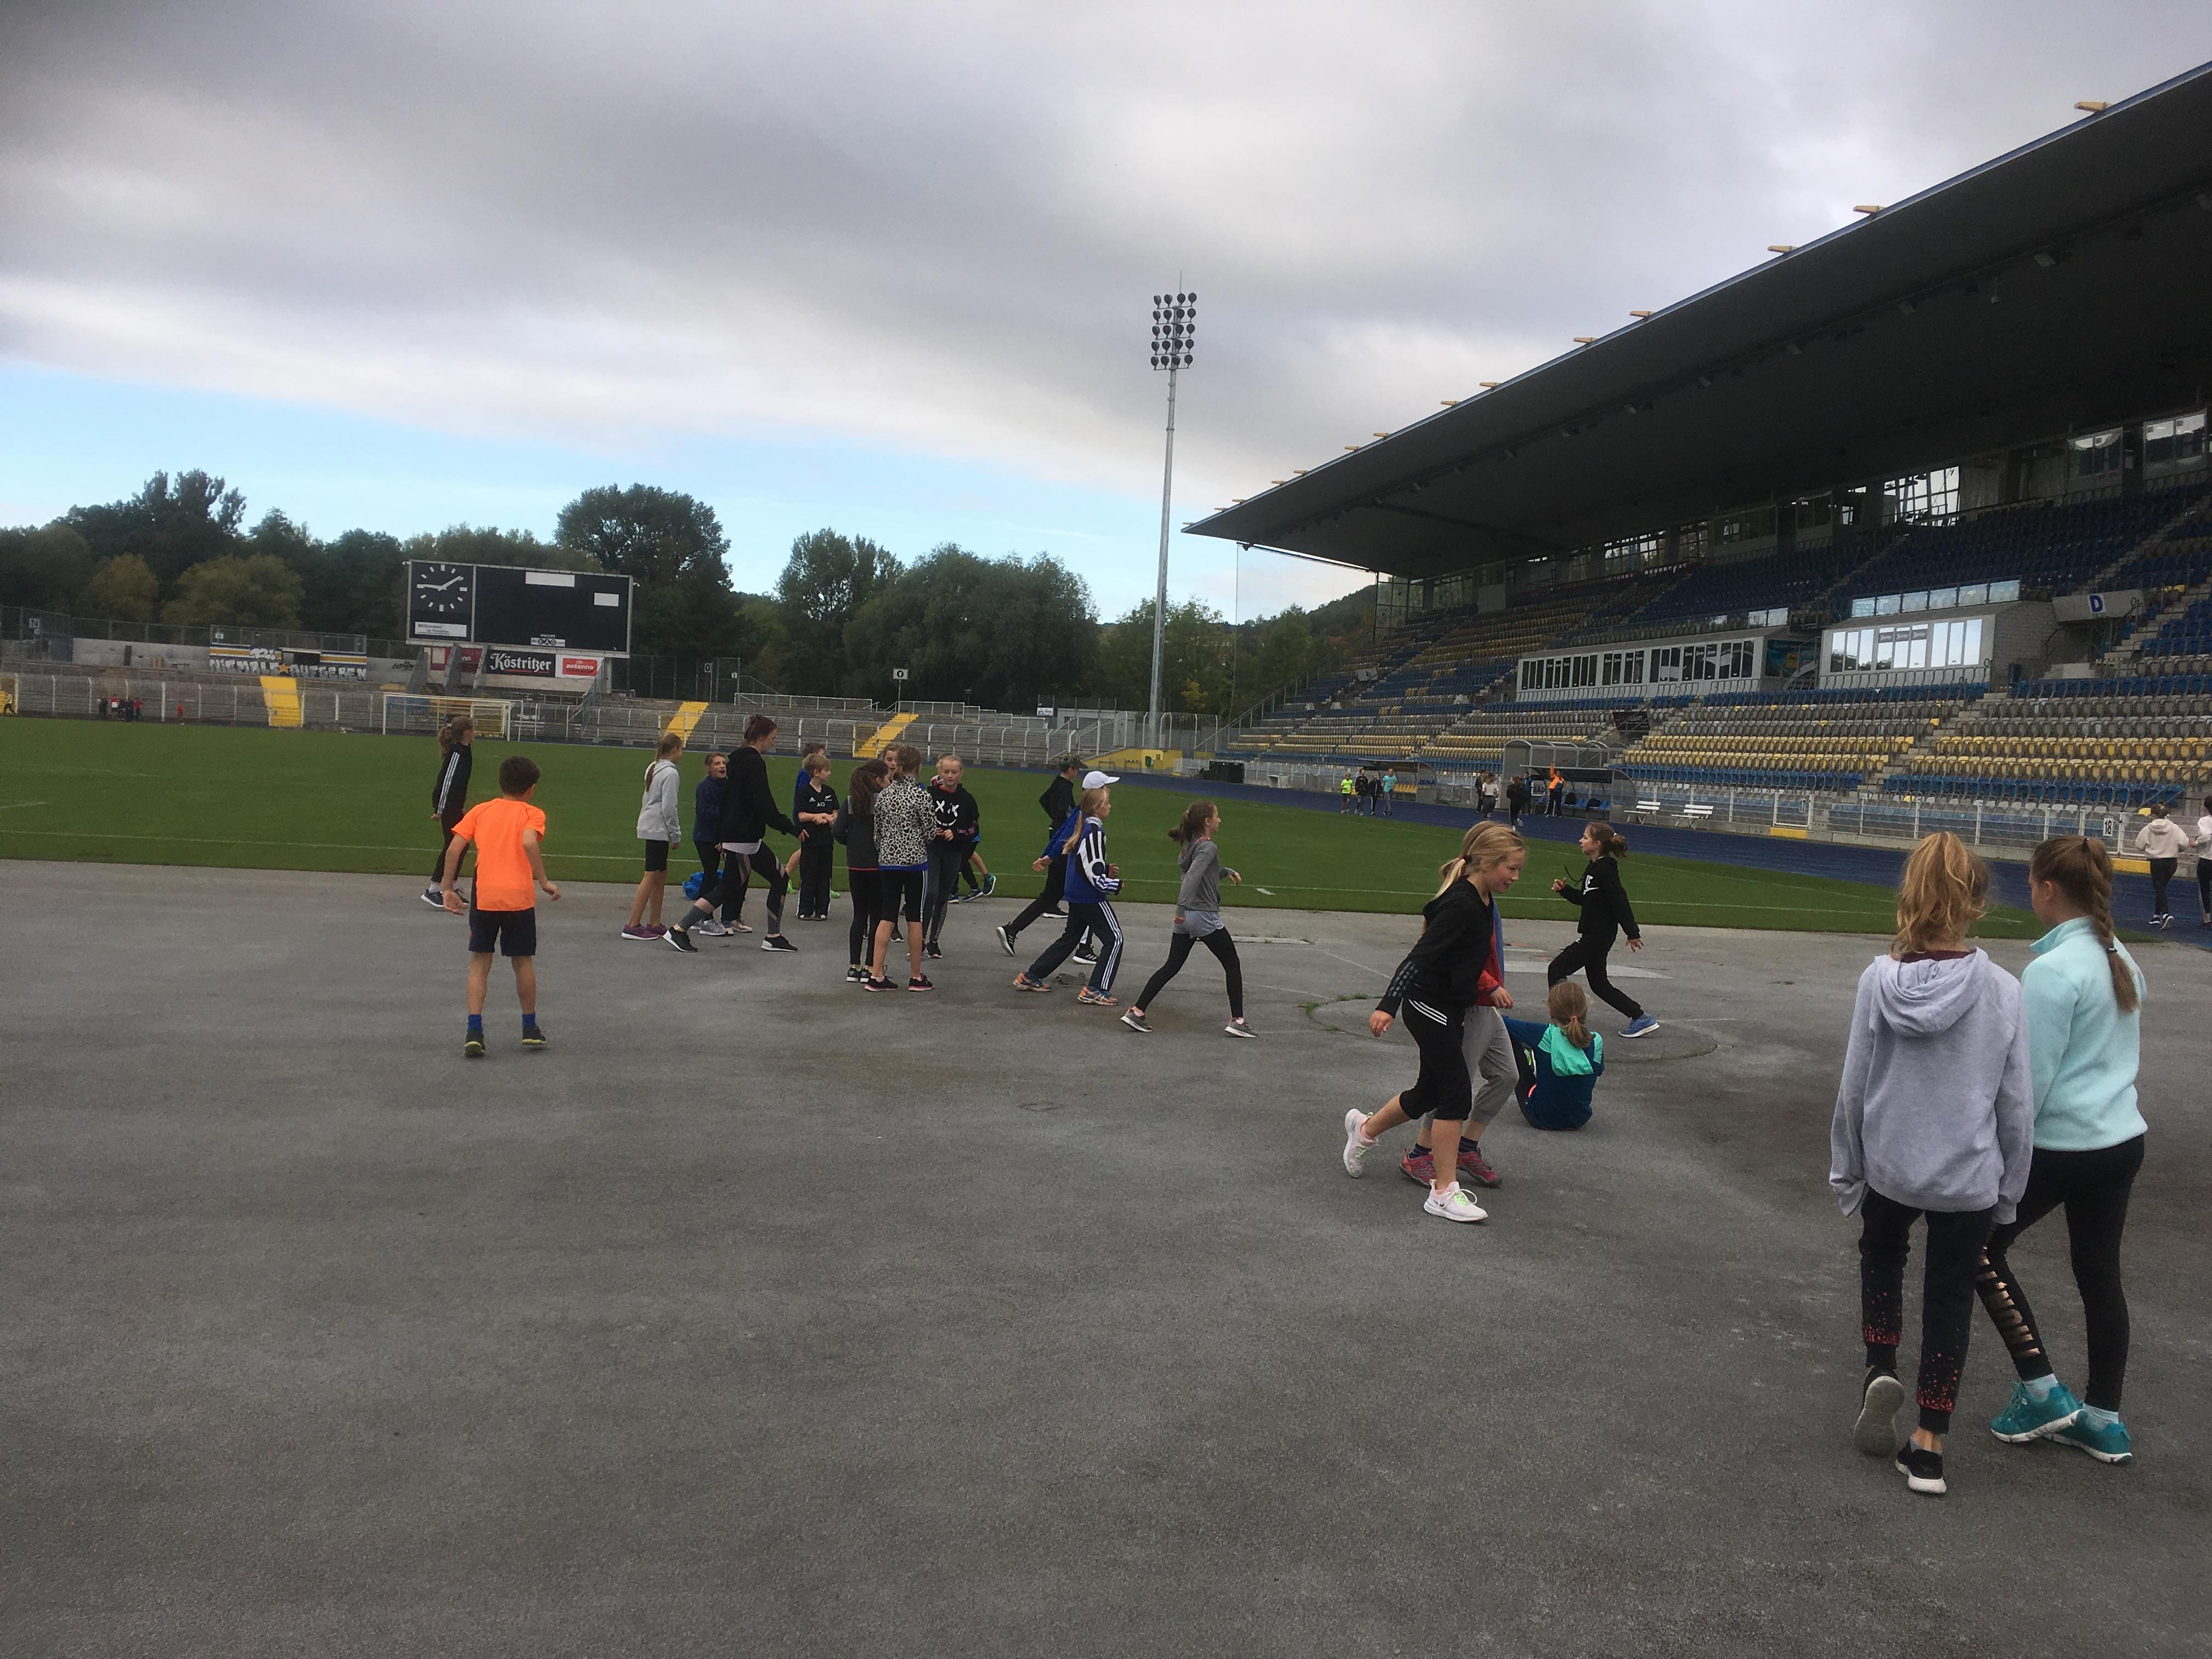 Sportfest am 26.09.2019 im Ernst-Abbe-Sportfeld